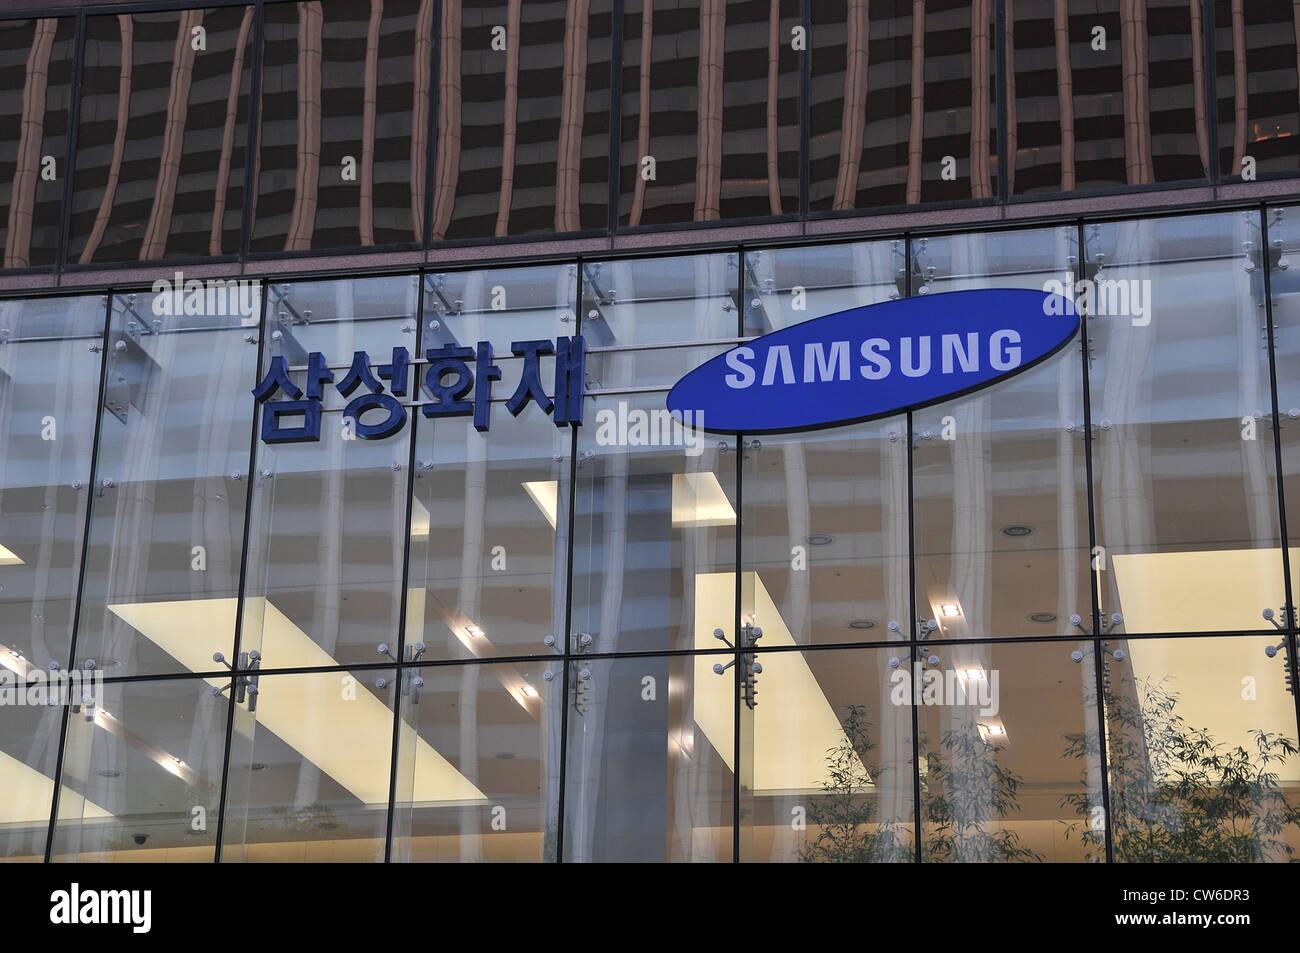 Samsung Seoul Südkorea Asien Bauen Stockfoto Bild 49929687 Alamy